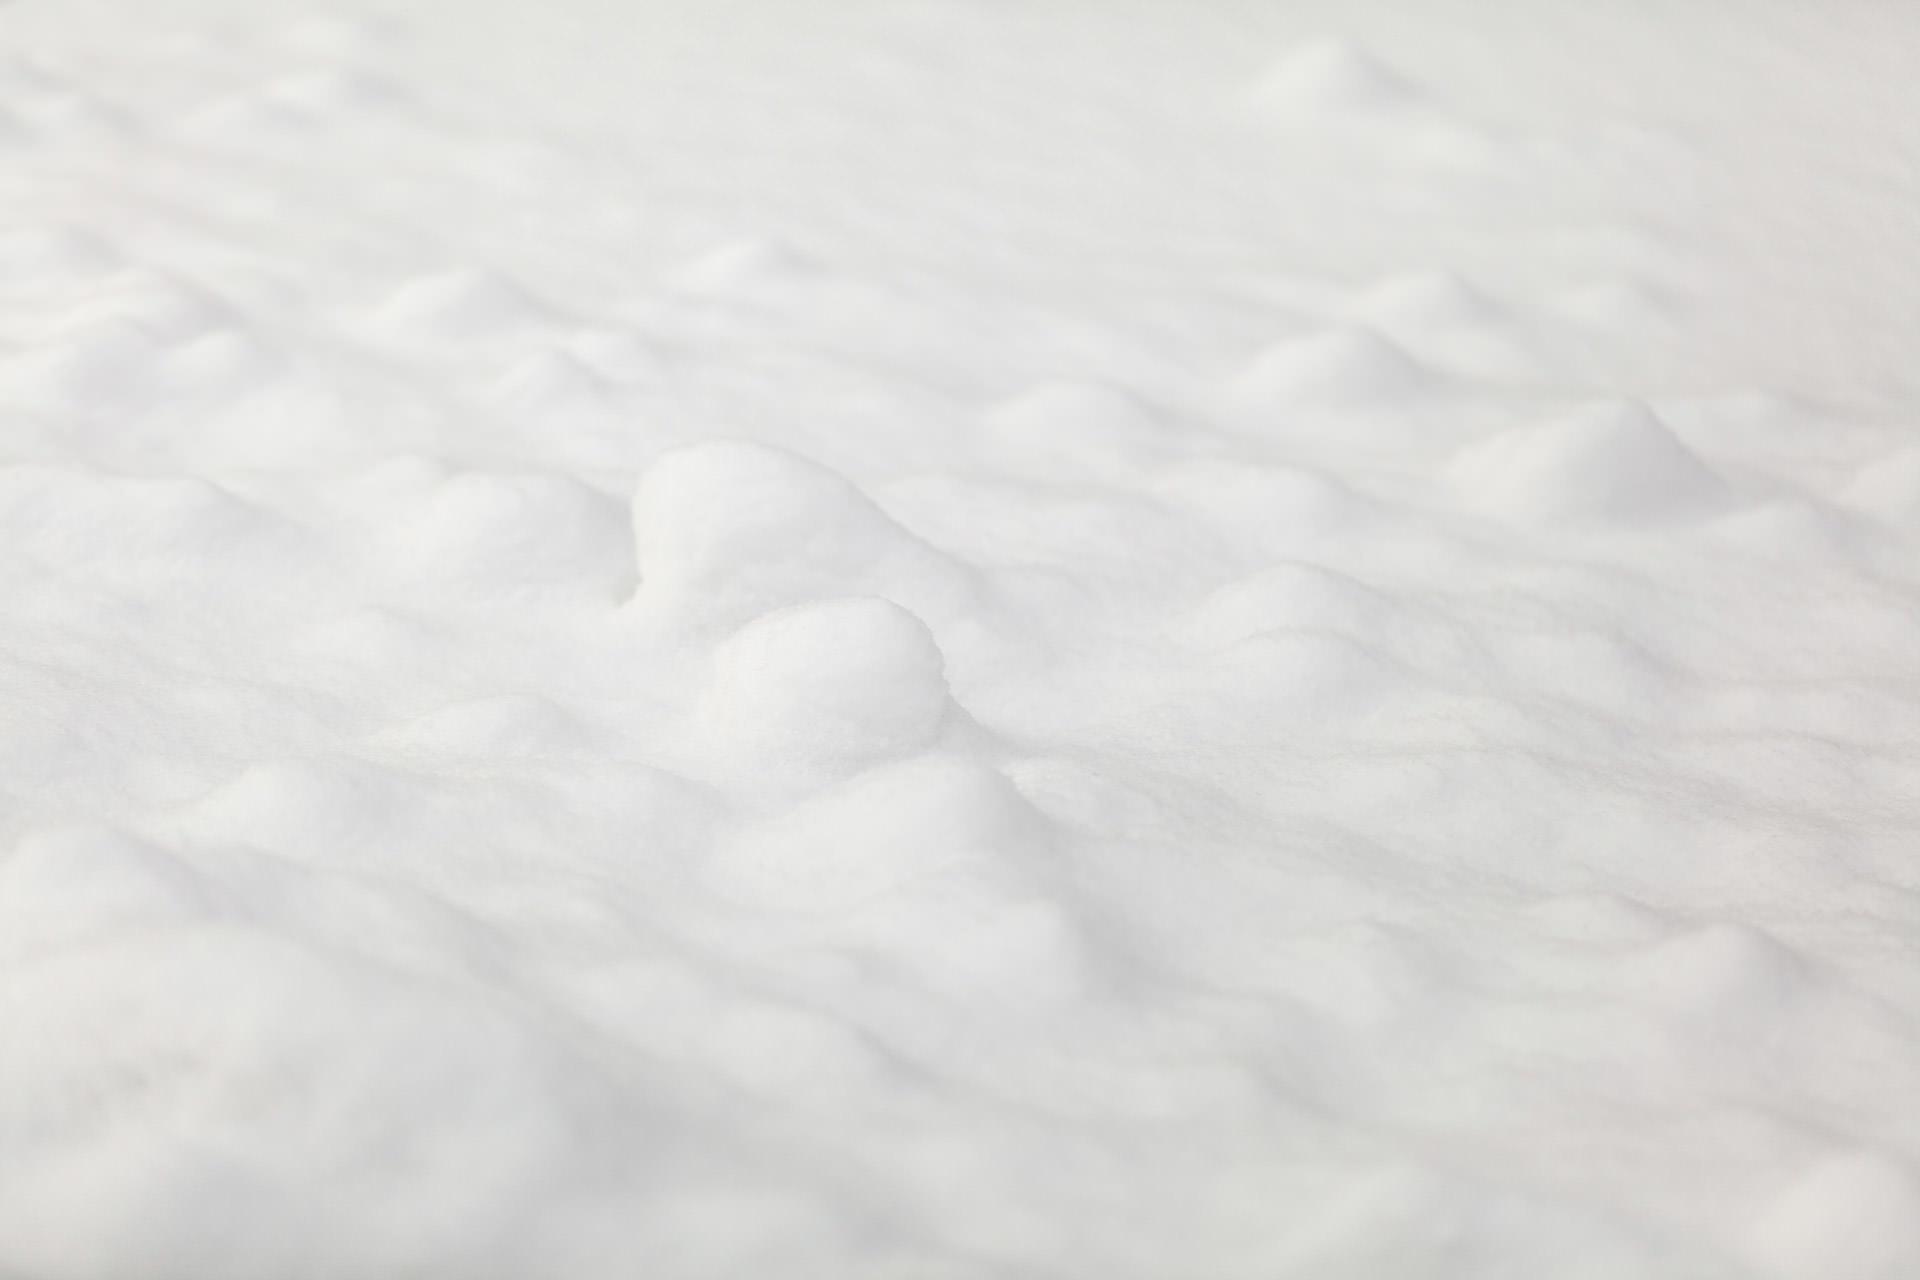 snow block texture